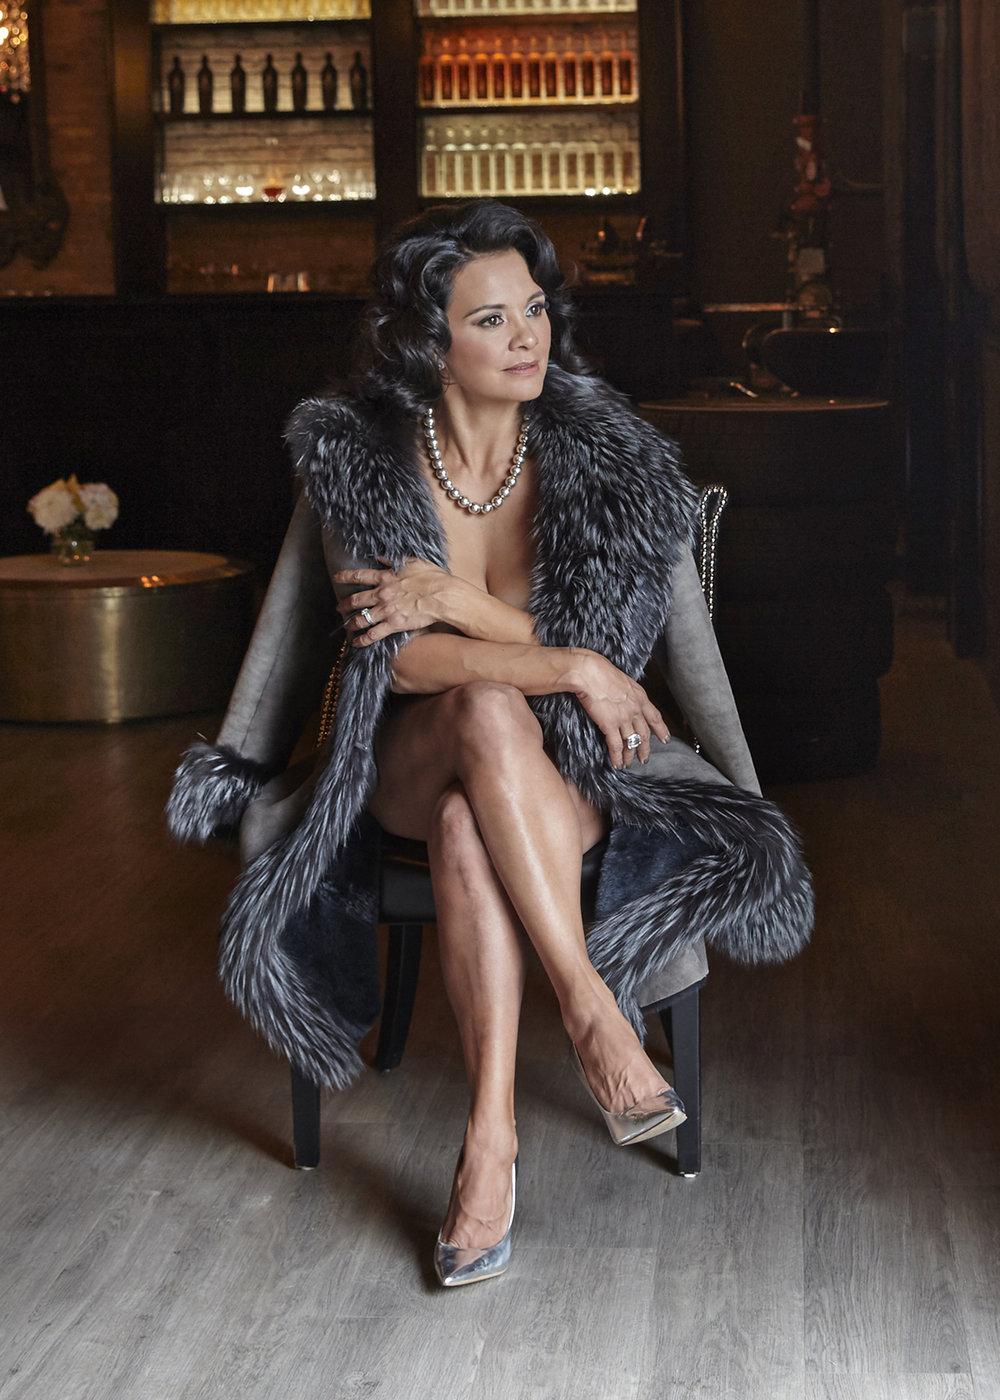 cindy-moleski-professional-boudoir-photography-saskatoon-saskatchewan- web 28983-2573e.jpg